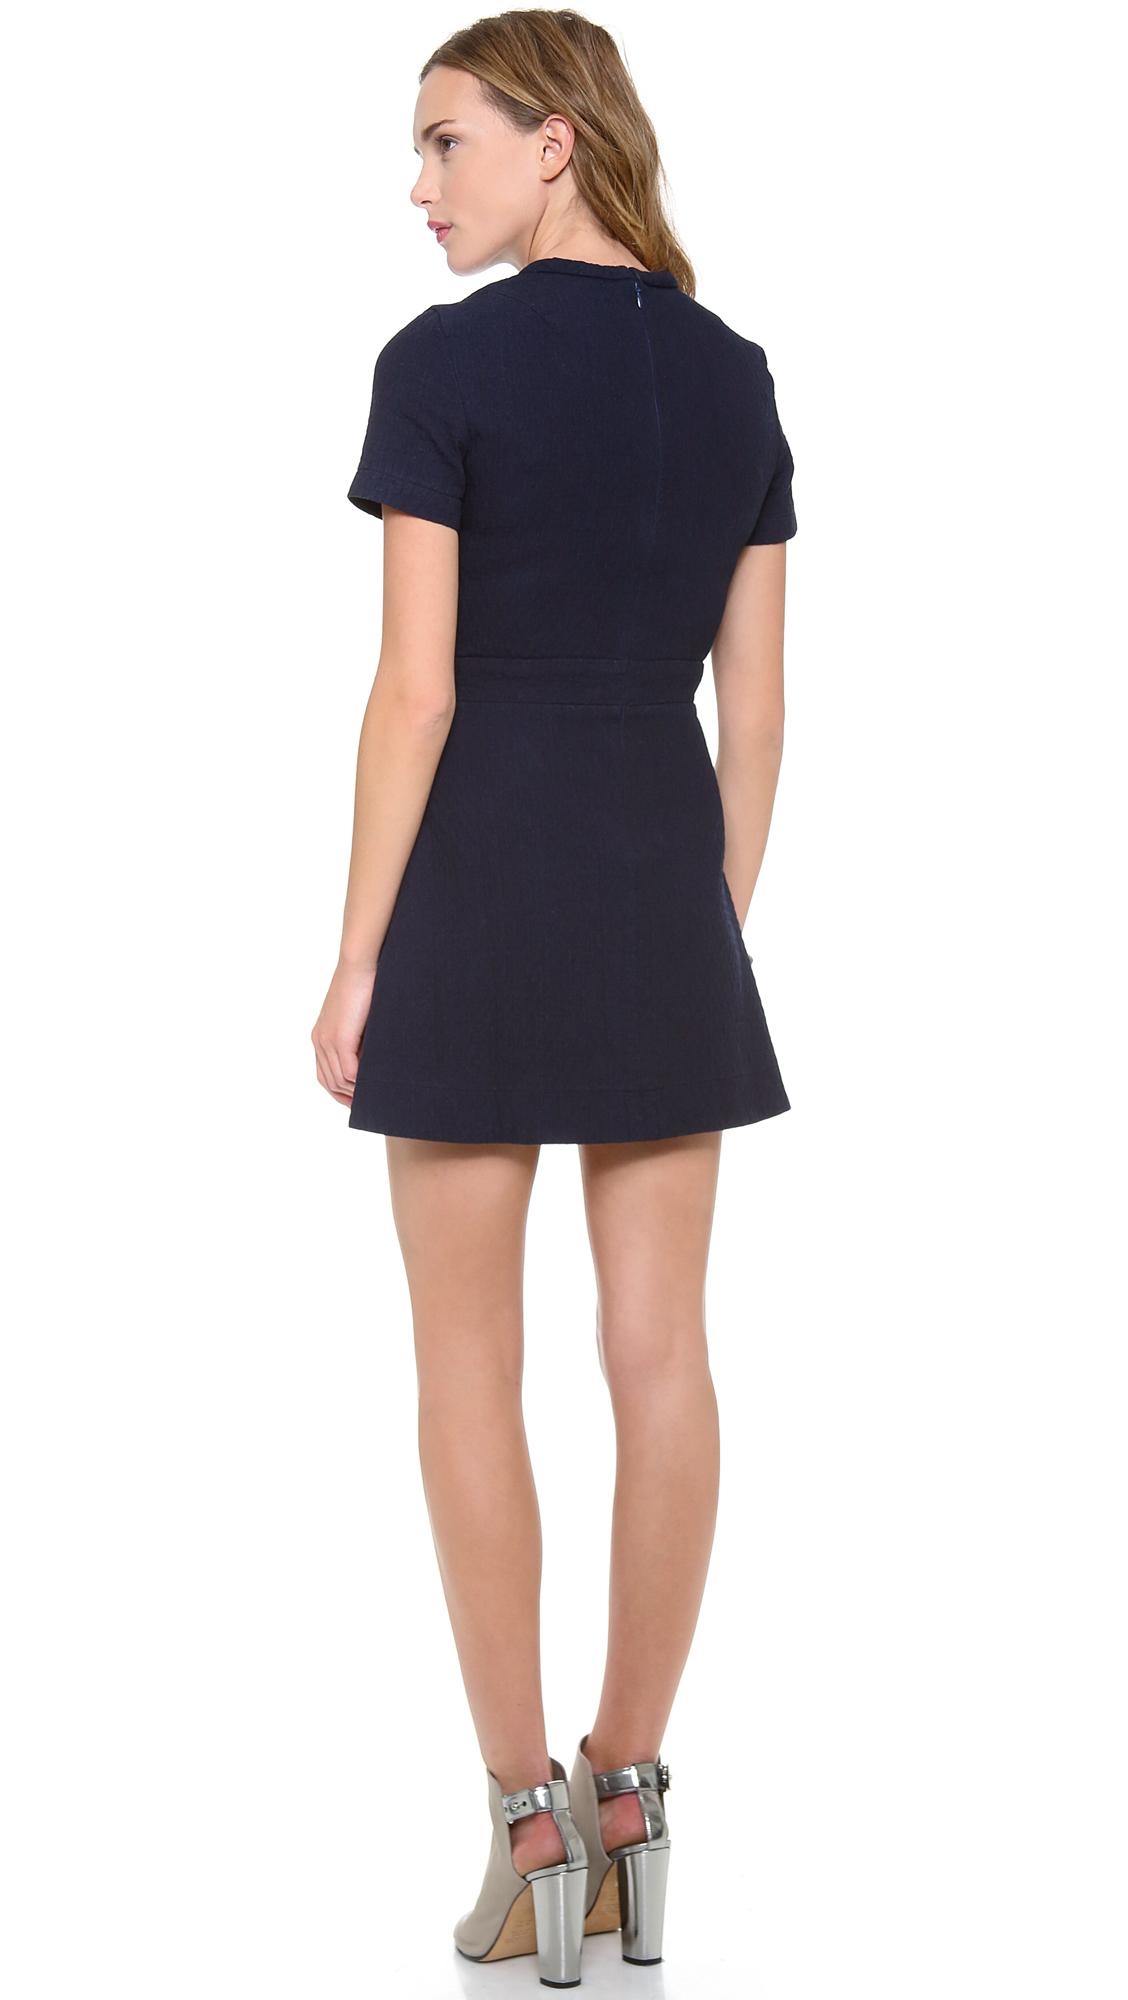 Victoria Beckham Quilted Dress